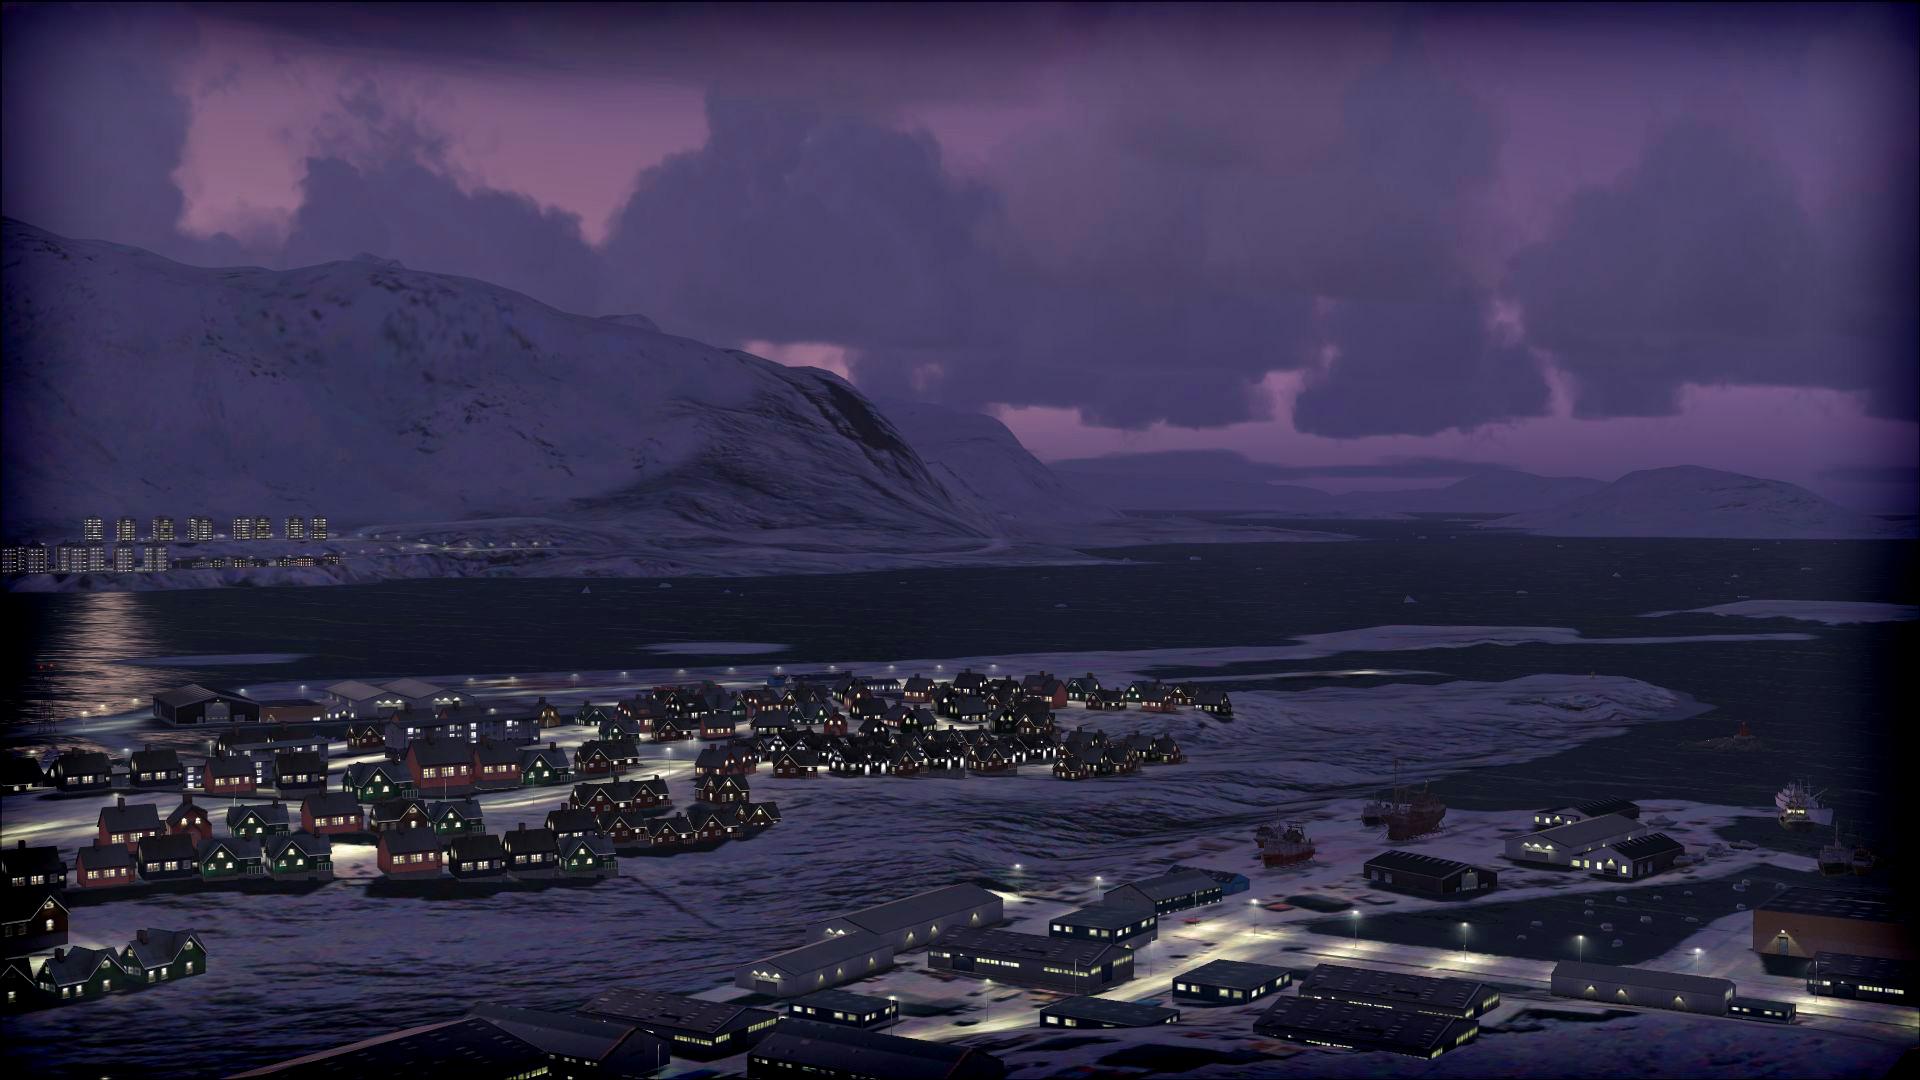 Top Five Greenland Capital Nuuk - Circus